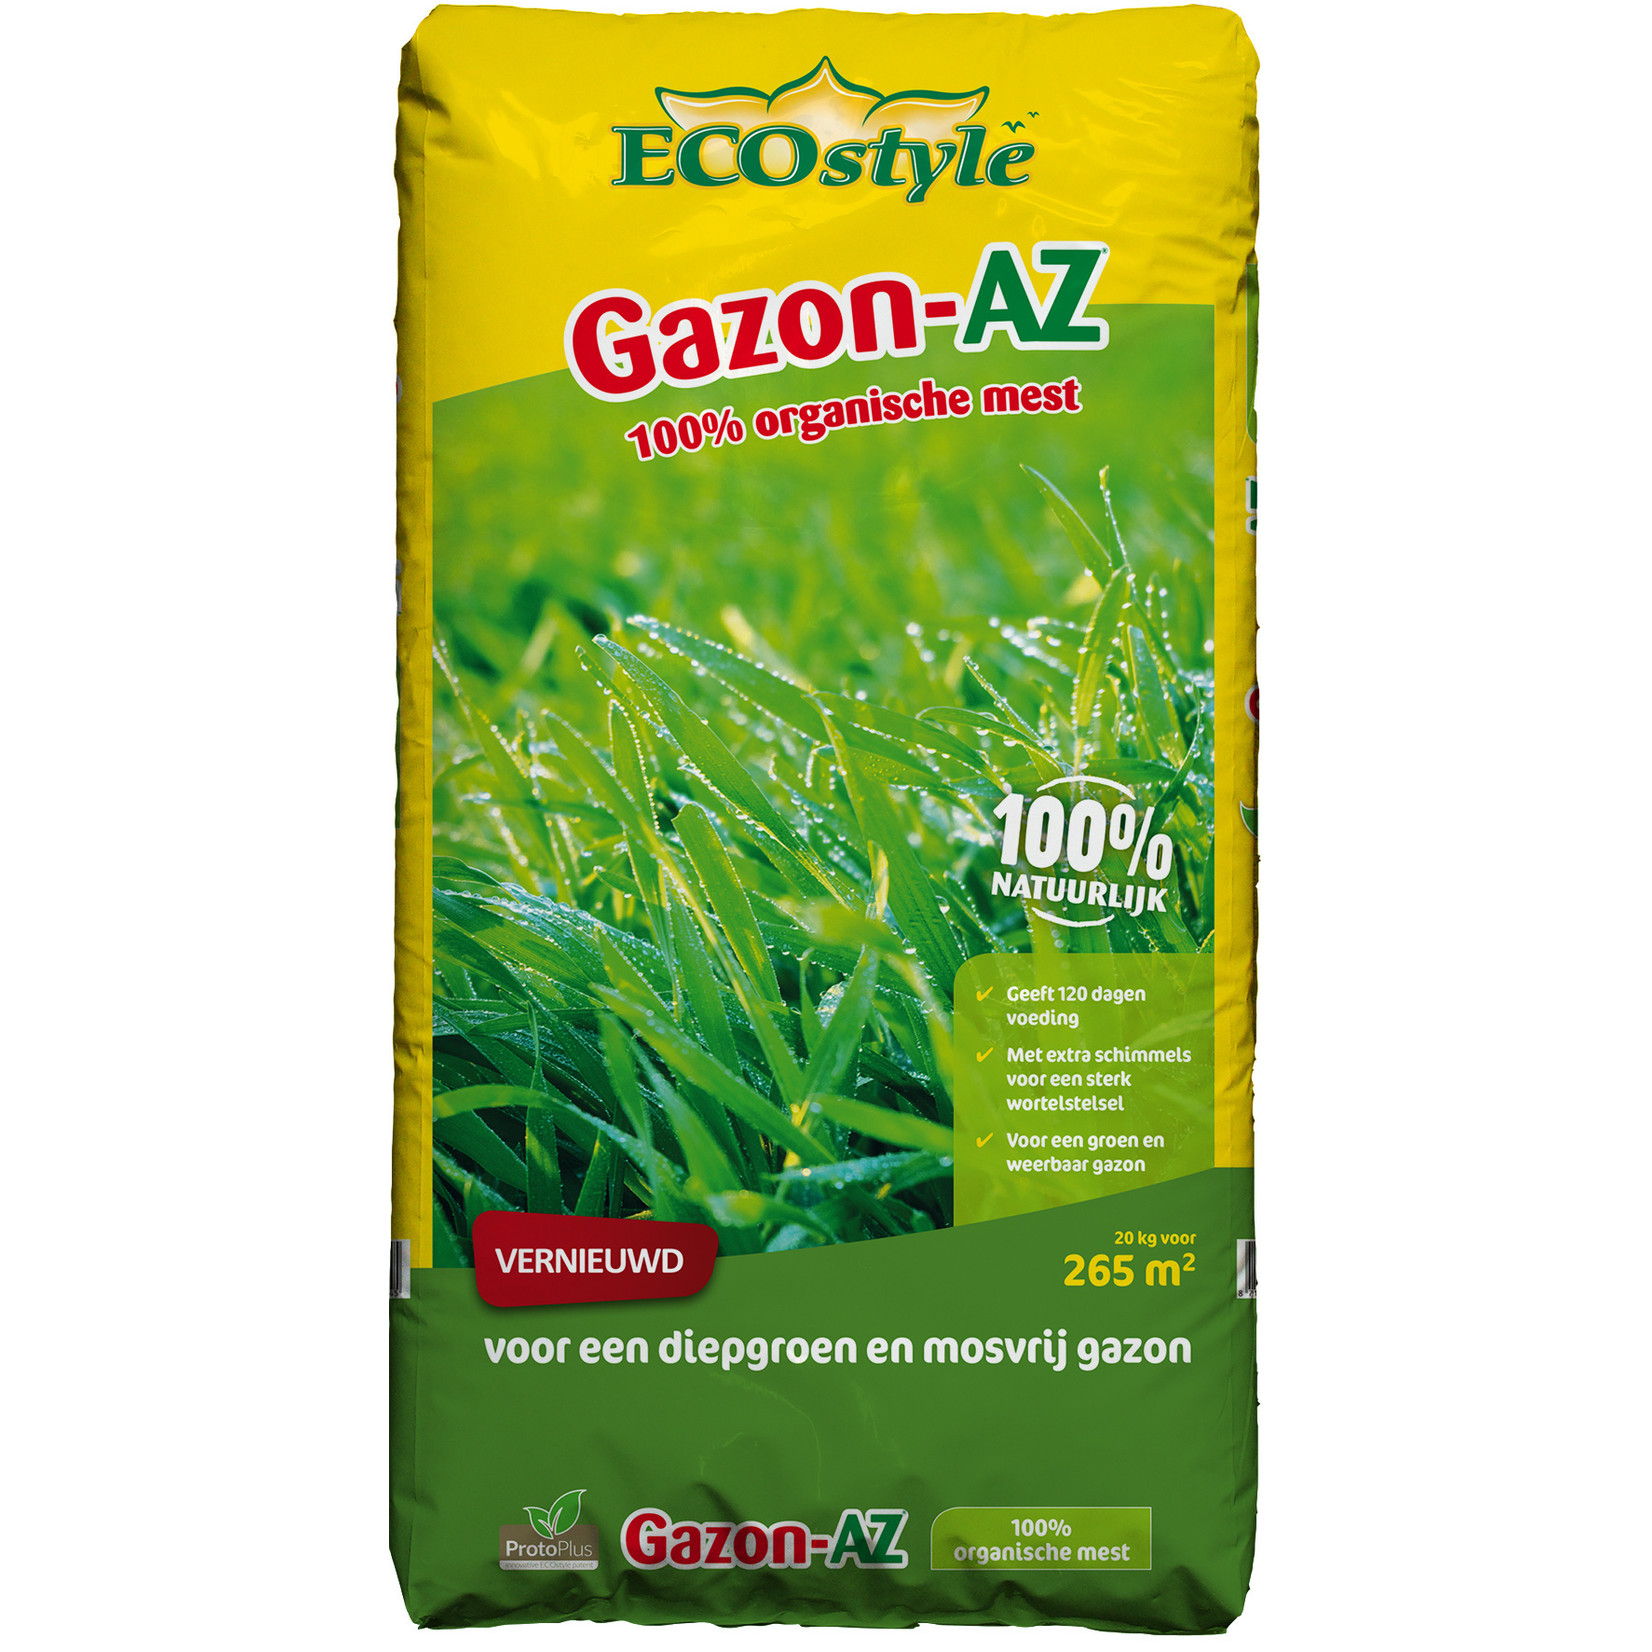 Ecostyle Gazon AZ 20 kg (265 m²) met ProtoPlus en RhizaMax